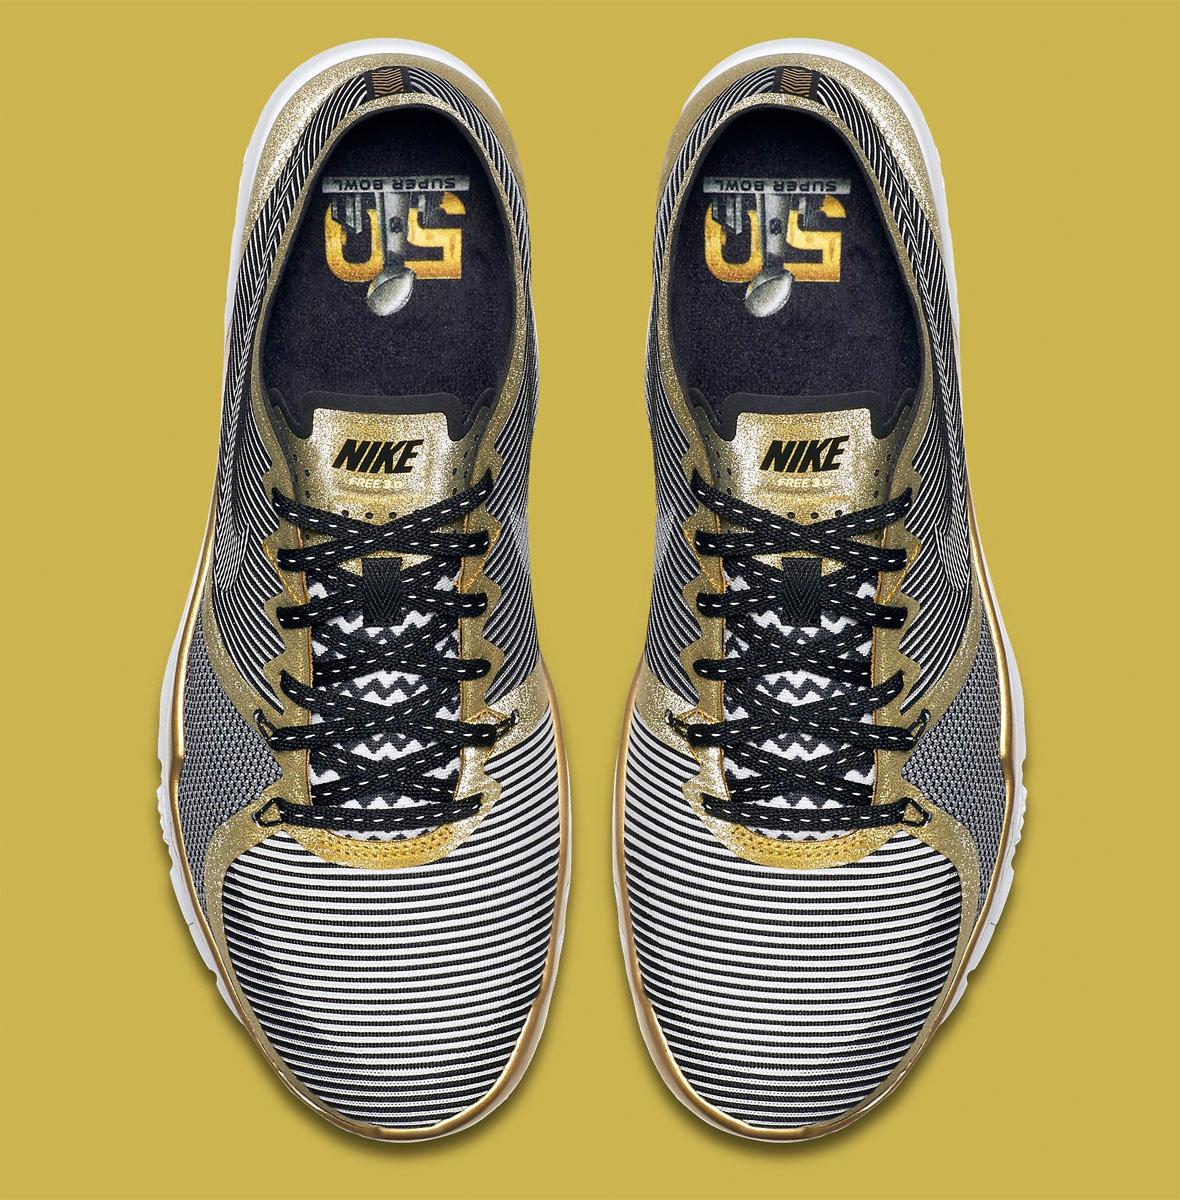 Nike Free 3.0 V4 Gold